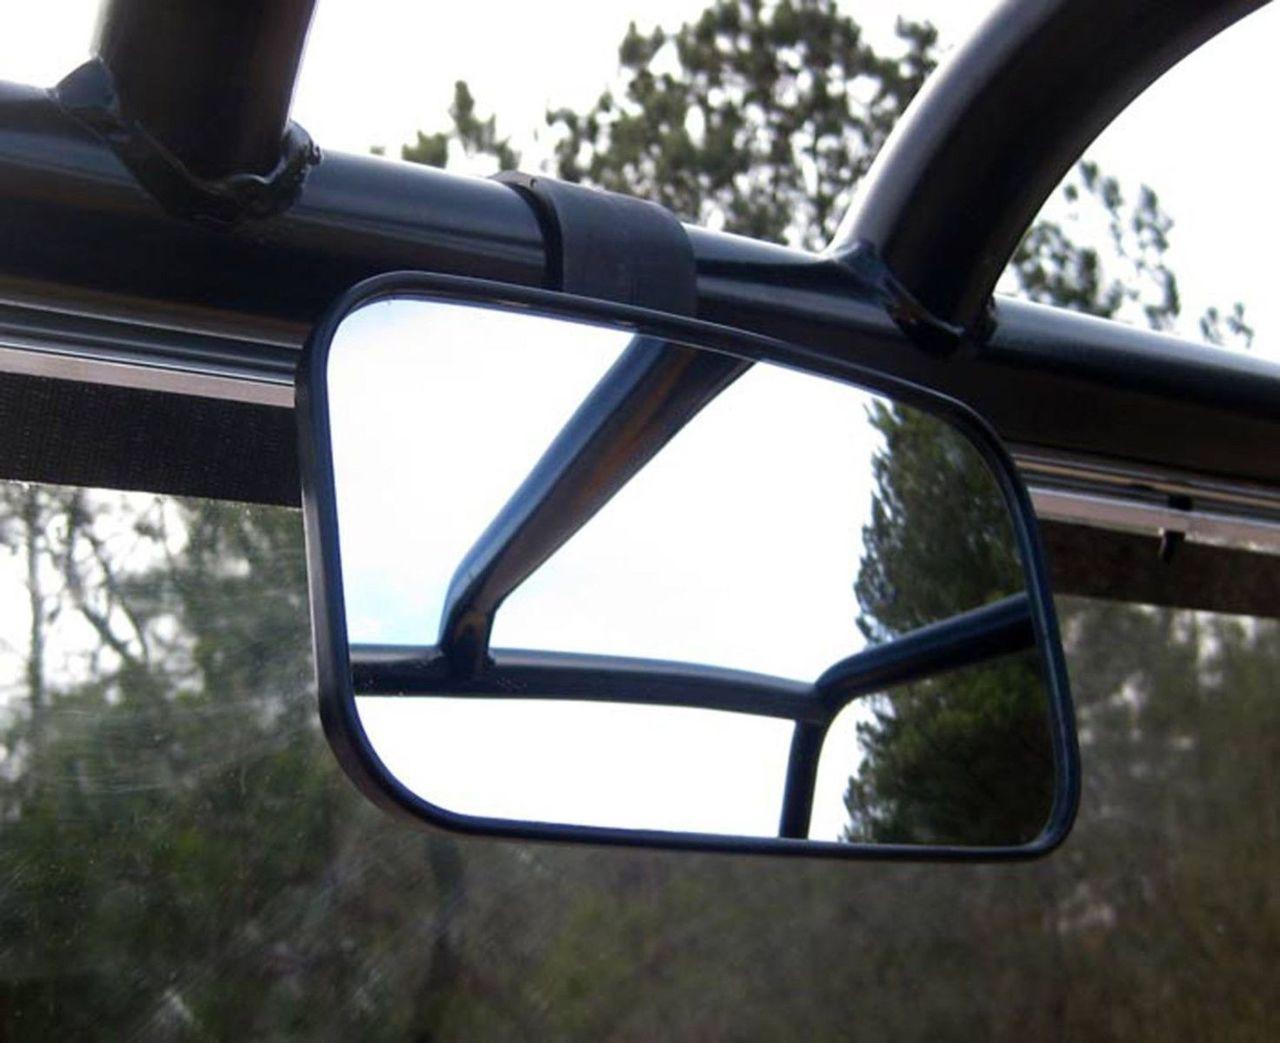 Seizmik UTV Side Mirrors Polaris Ranger Xp900 Pro-Fit Roll Cage